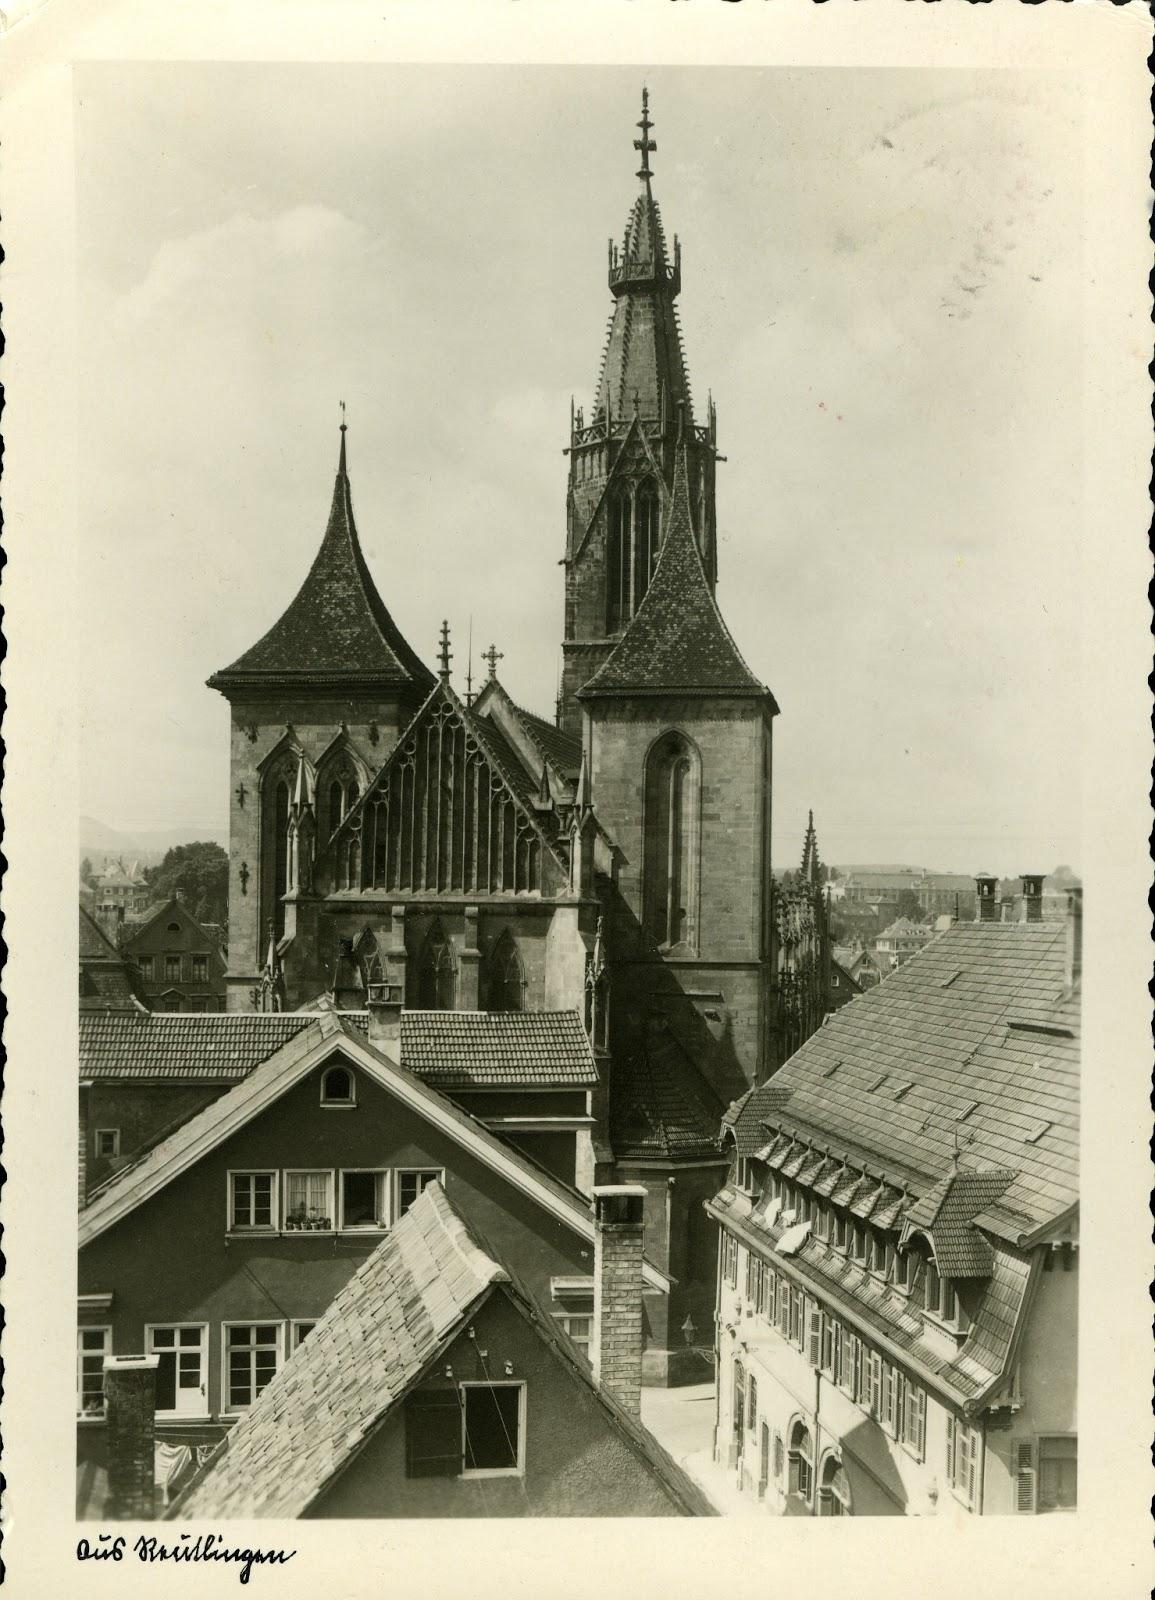 bildertanz marienkirche 1941 gru aus reutlingen. Black Bedroom Furniture Sets. Home Design Ideas